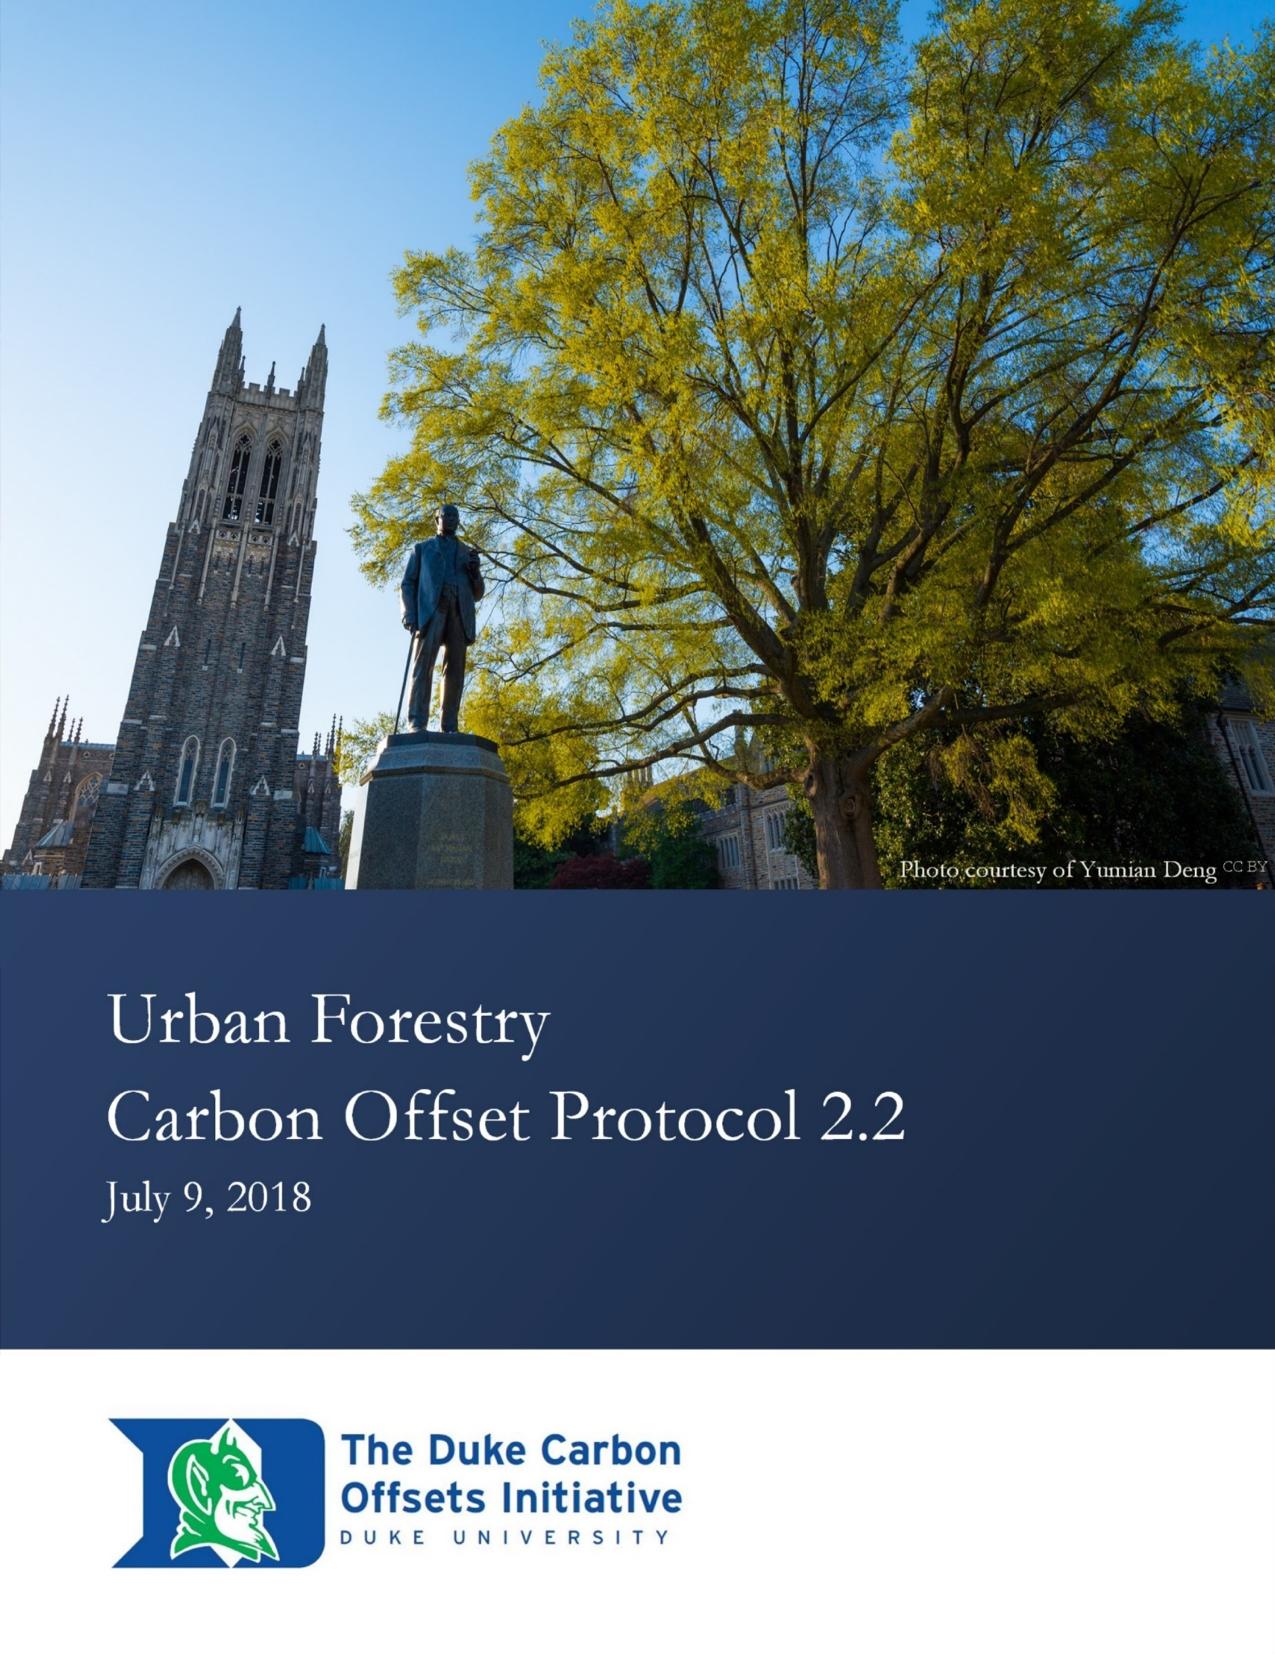 Urban Forestry Protocol